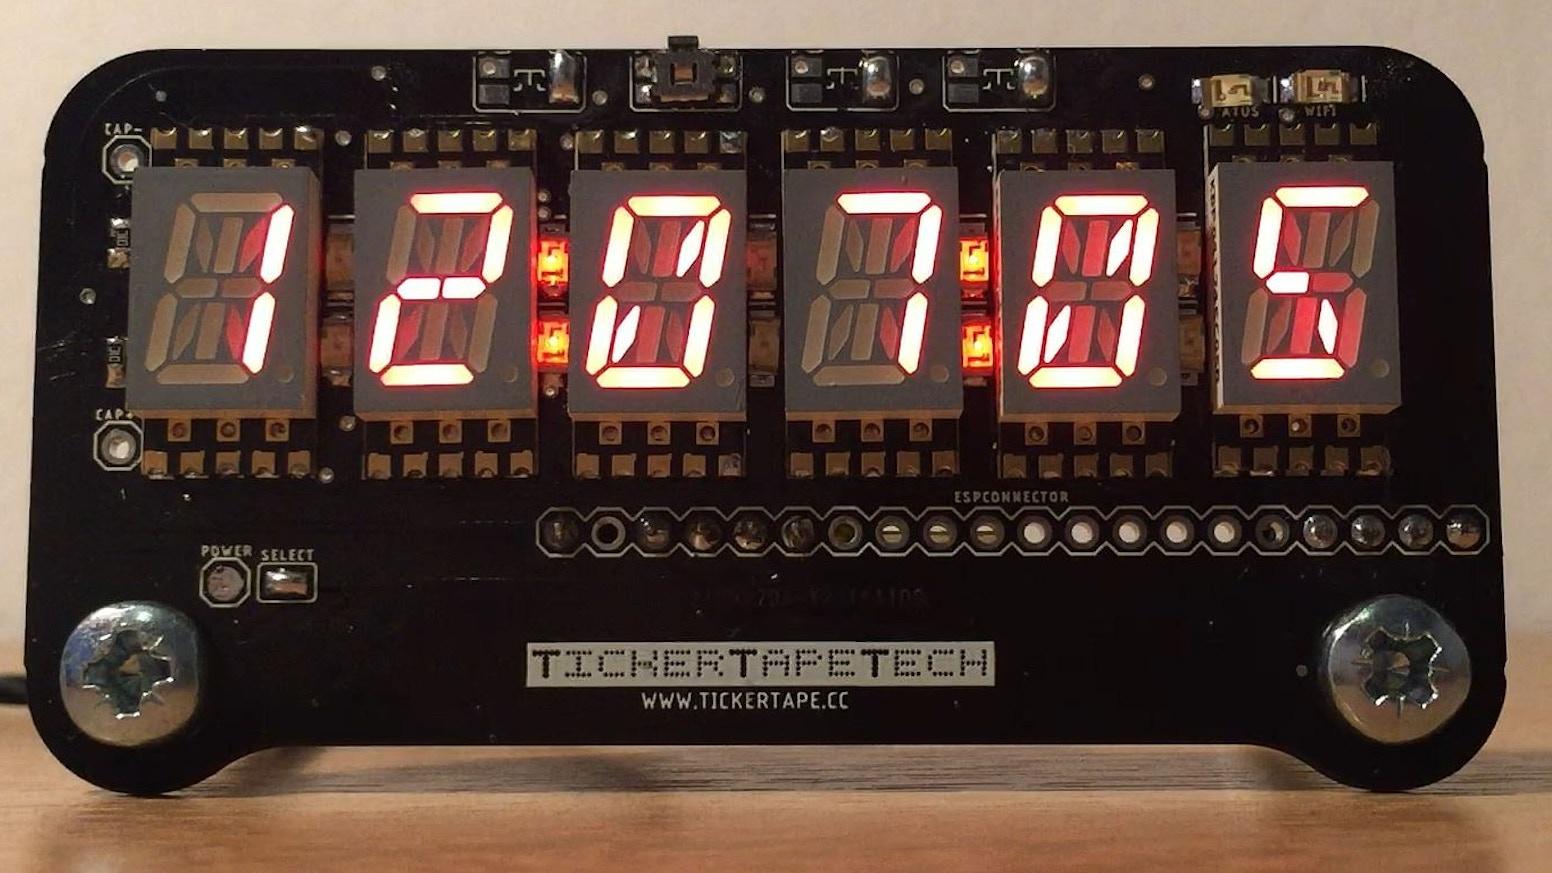 TickerTape Retro Display by Darren — Kickstarter